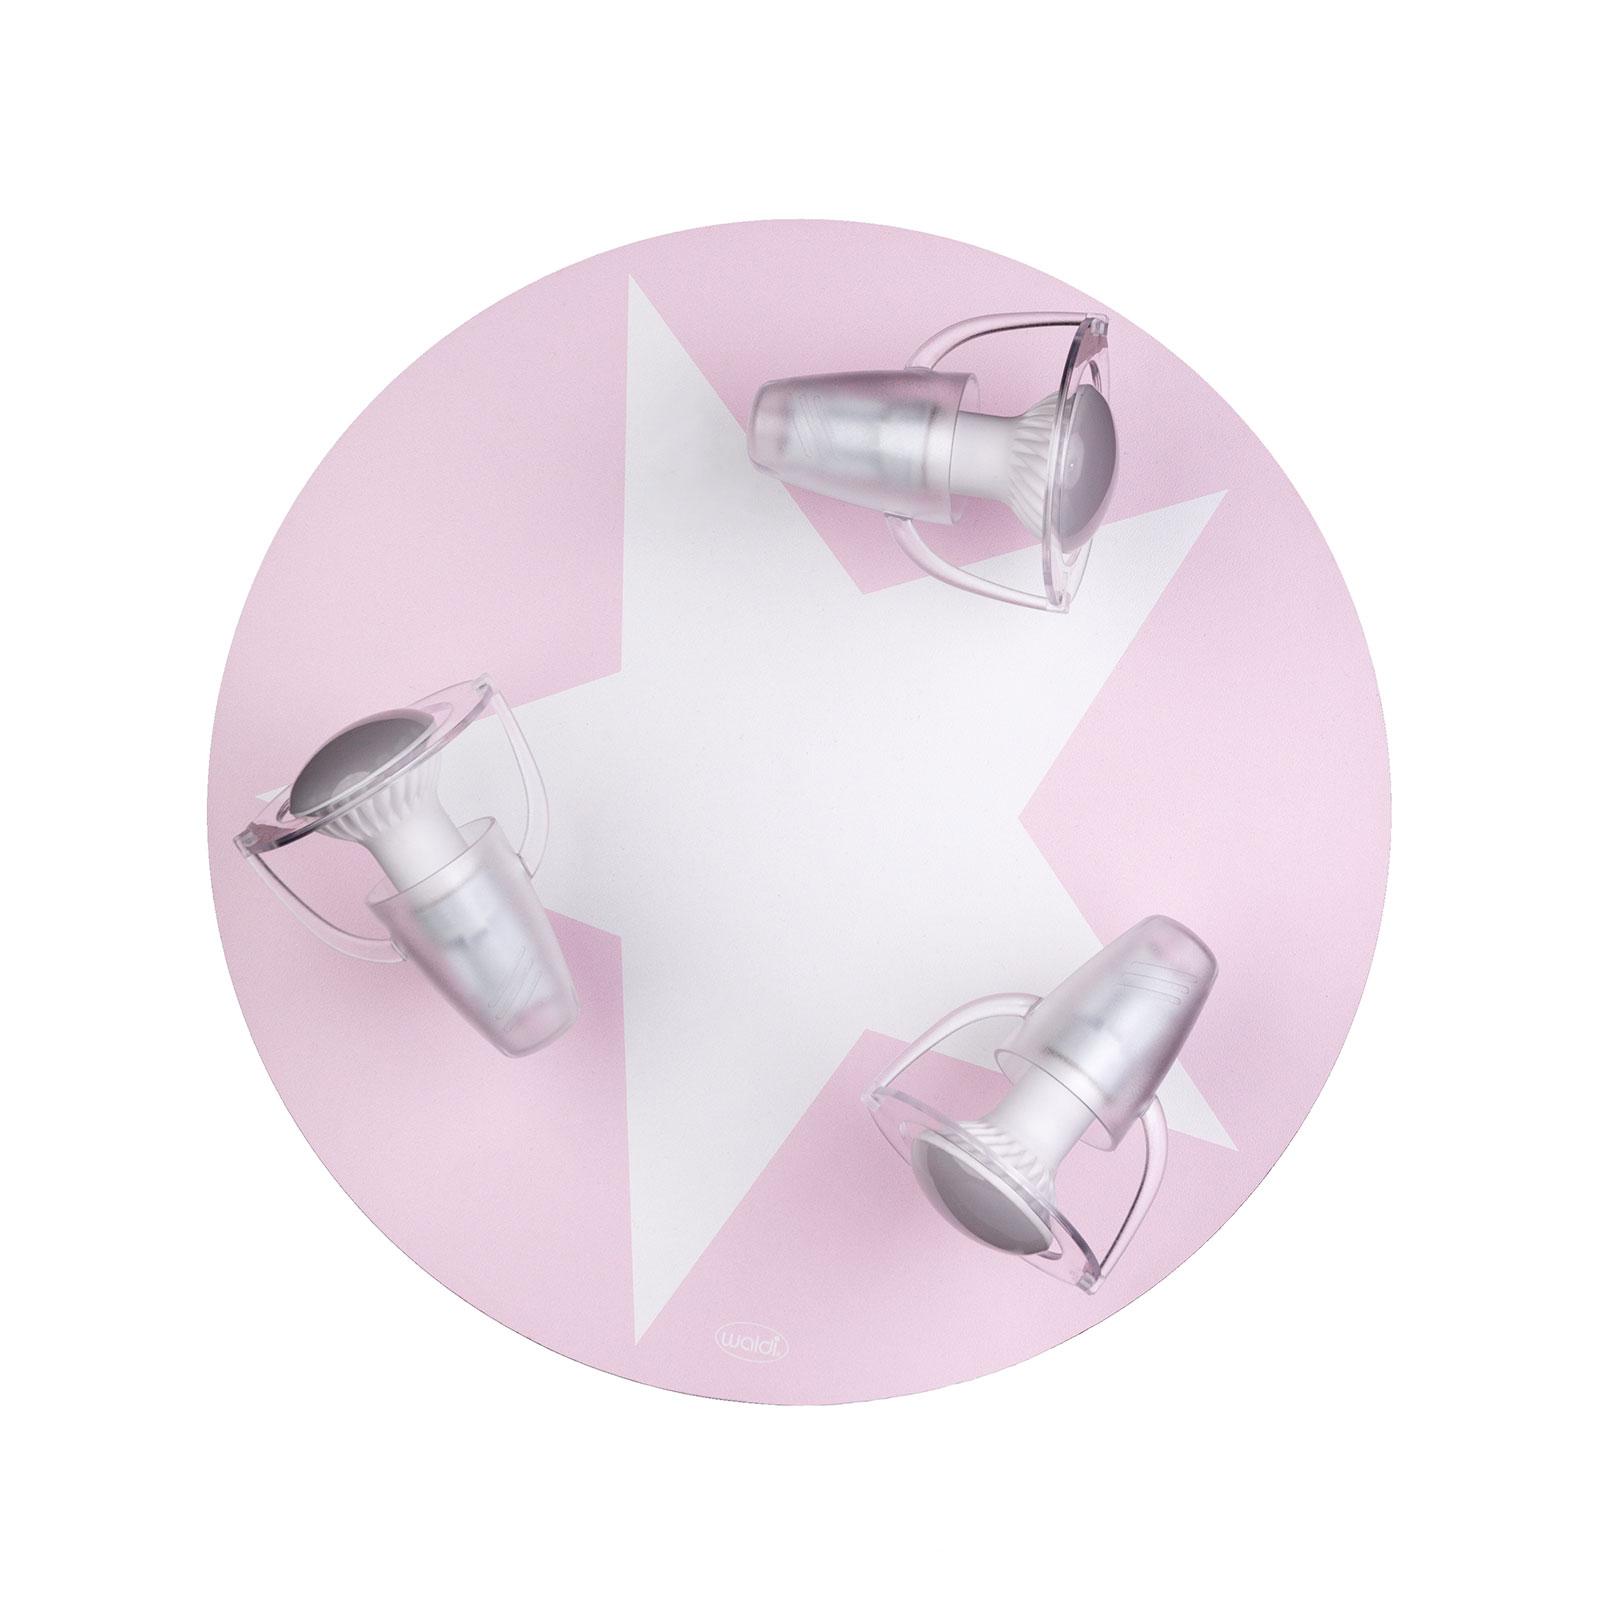 Plafondlamp ster in roze